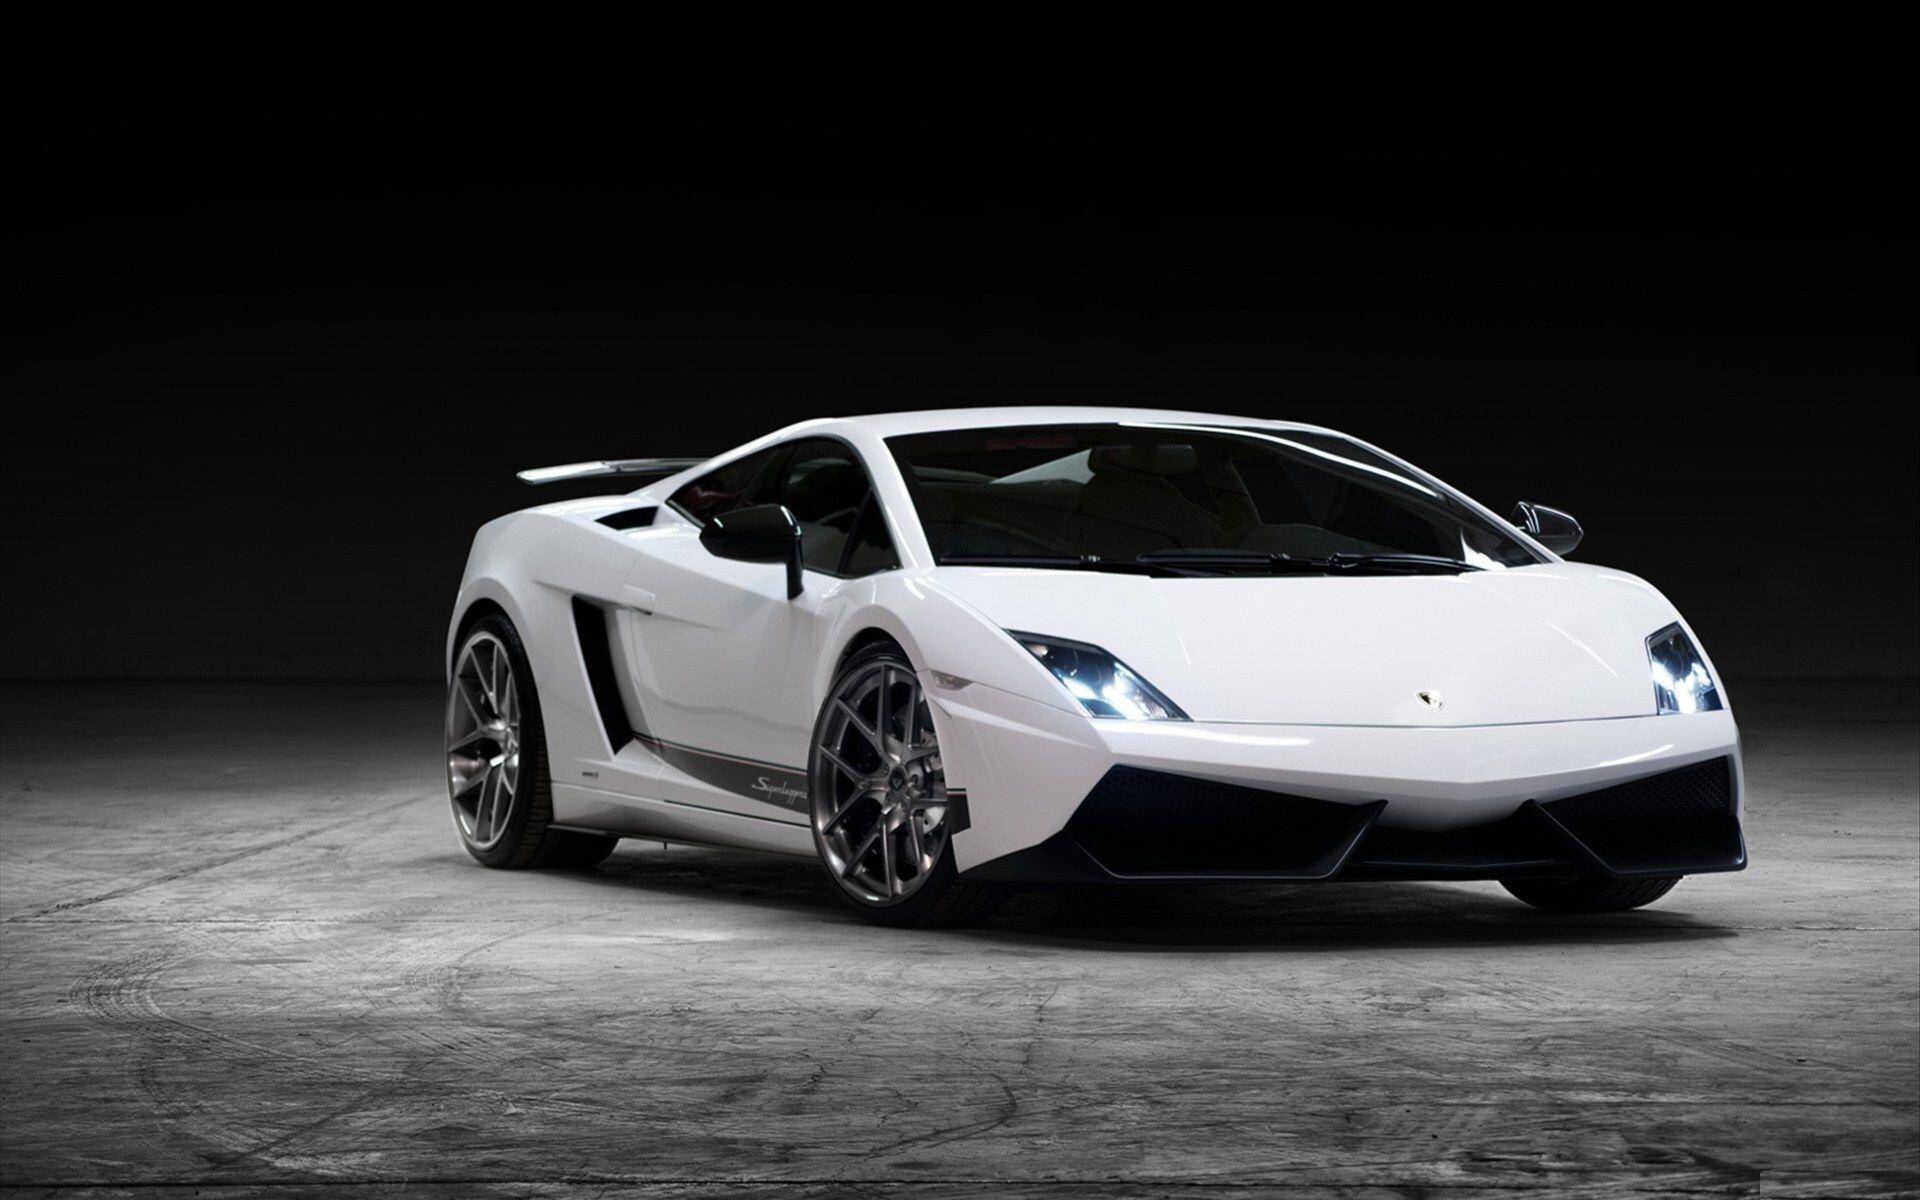 White Lamborghini Gallardo Car Wallpapers